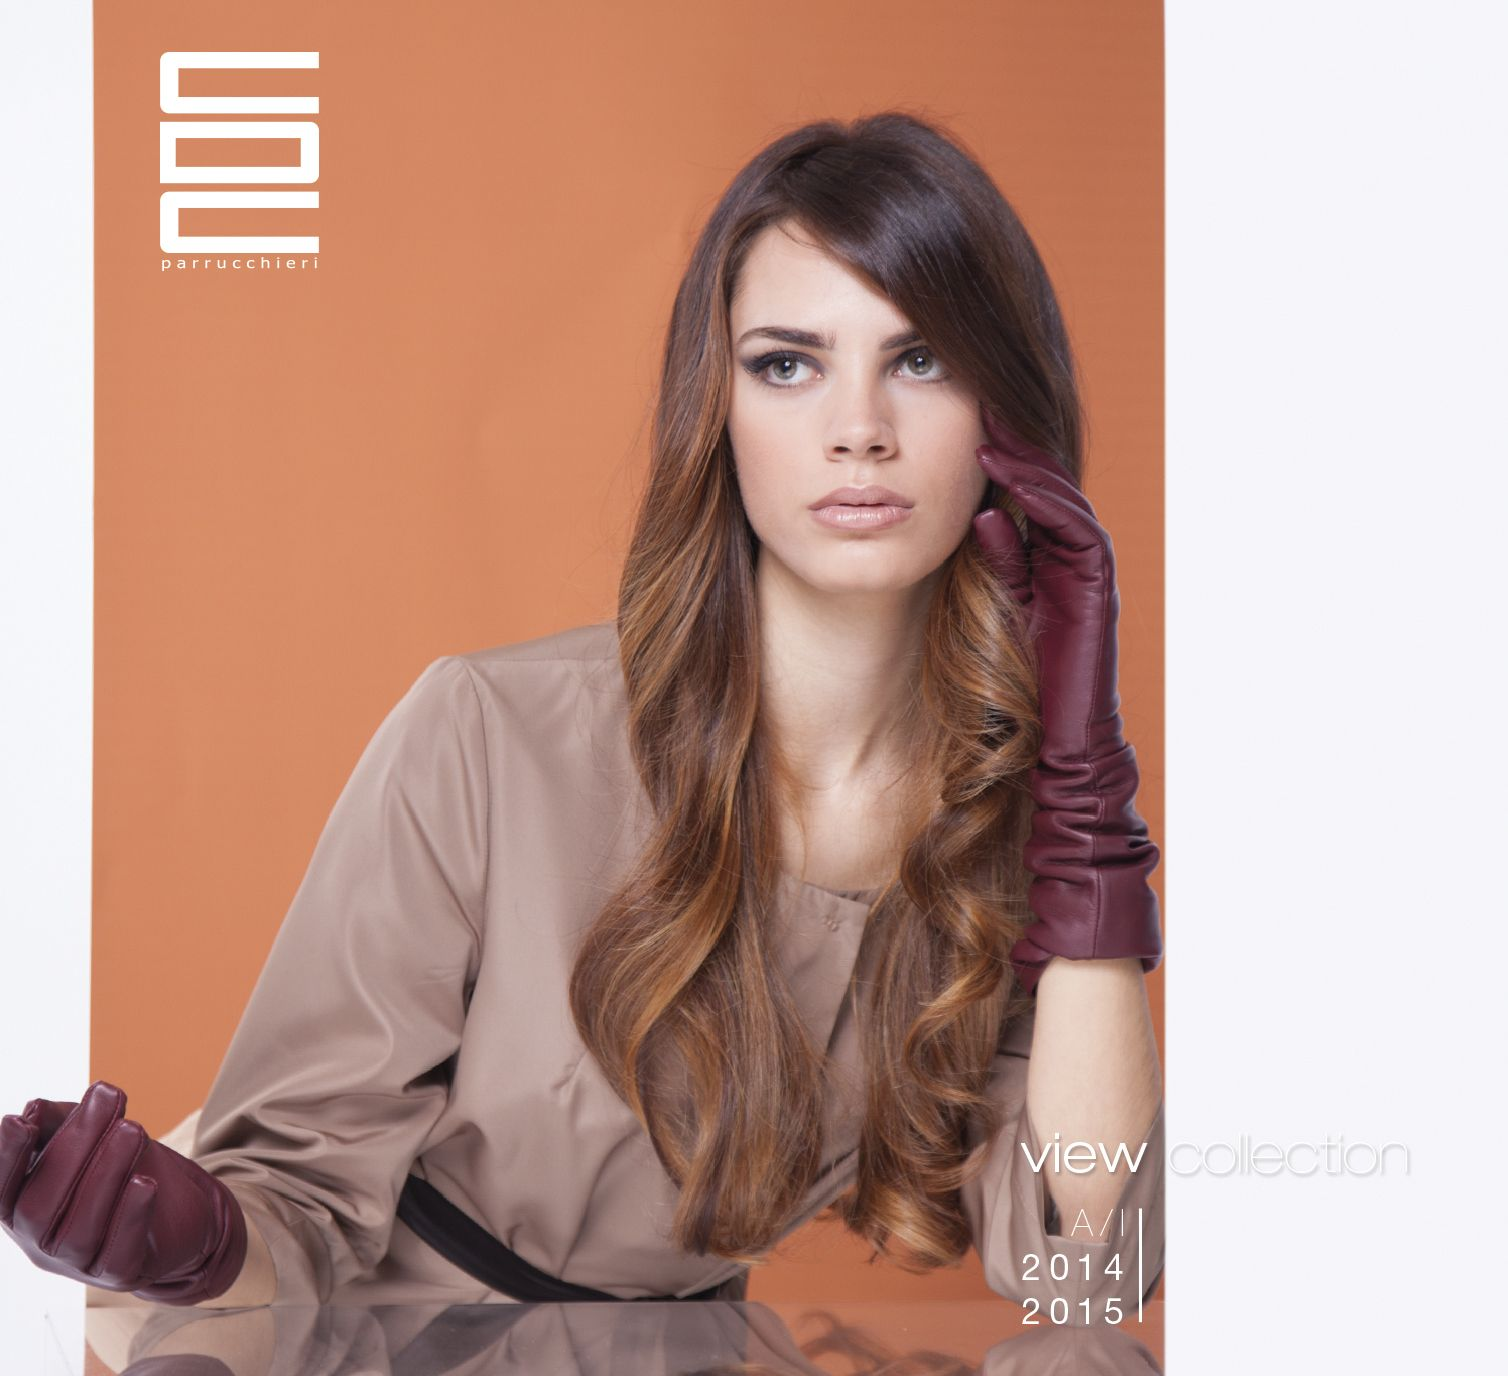 FW COLLECTION 14/15 #centrodegradeconseil #cdc #cdcparrucchieri #view #collection #viewcollection #hair #color #style #degrade #hairbeauty #hairmodel #haircare #fashionhair #haircolor #hairstyle #haircreation #sfumaturechefannoladifferenza